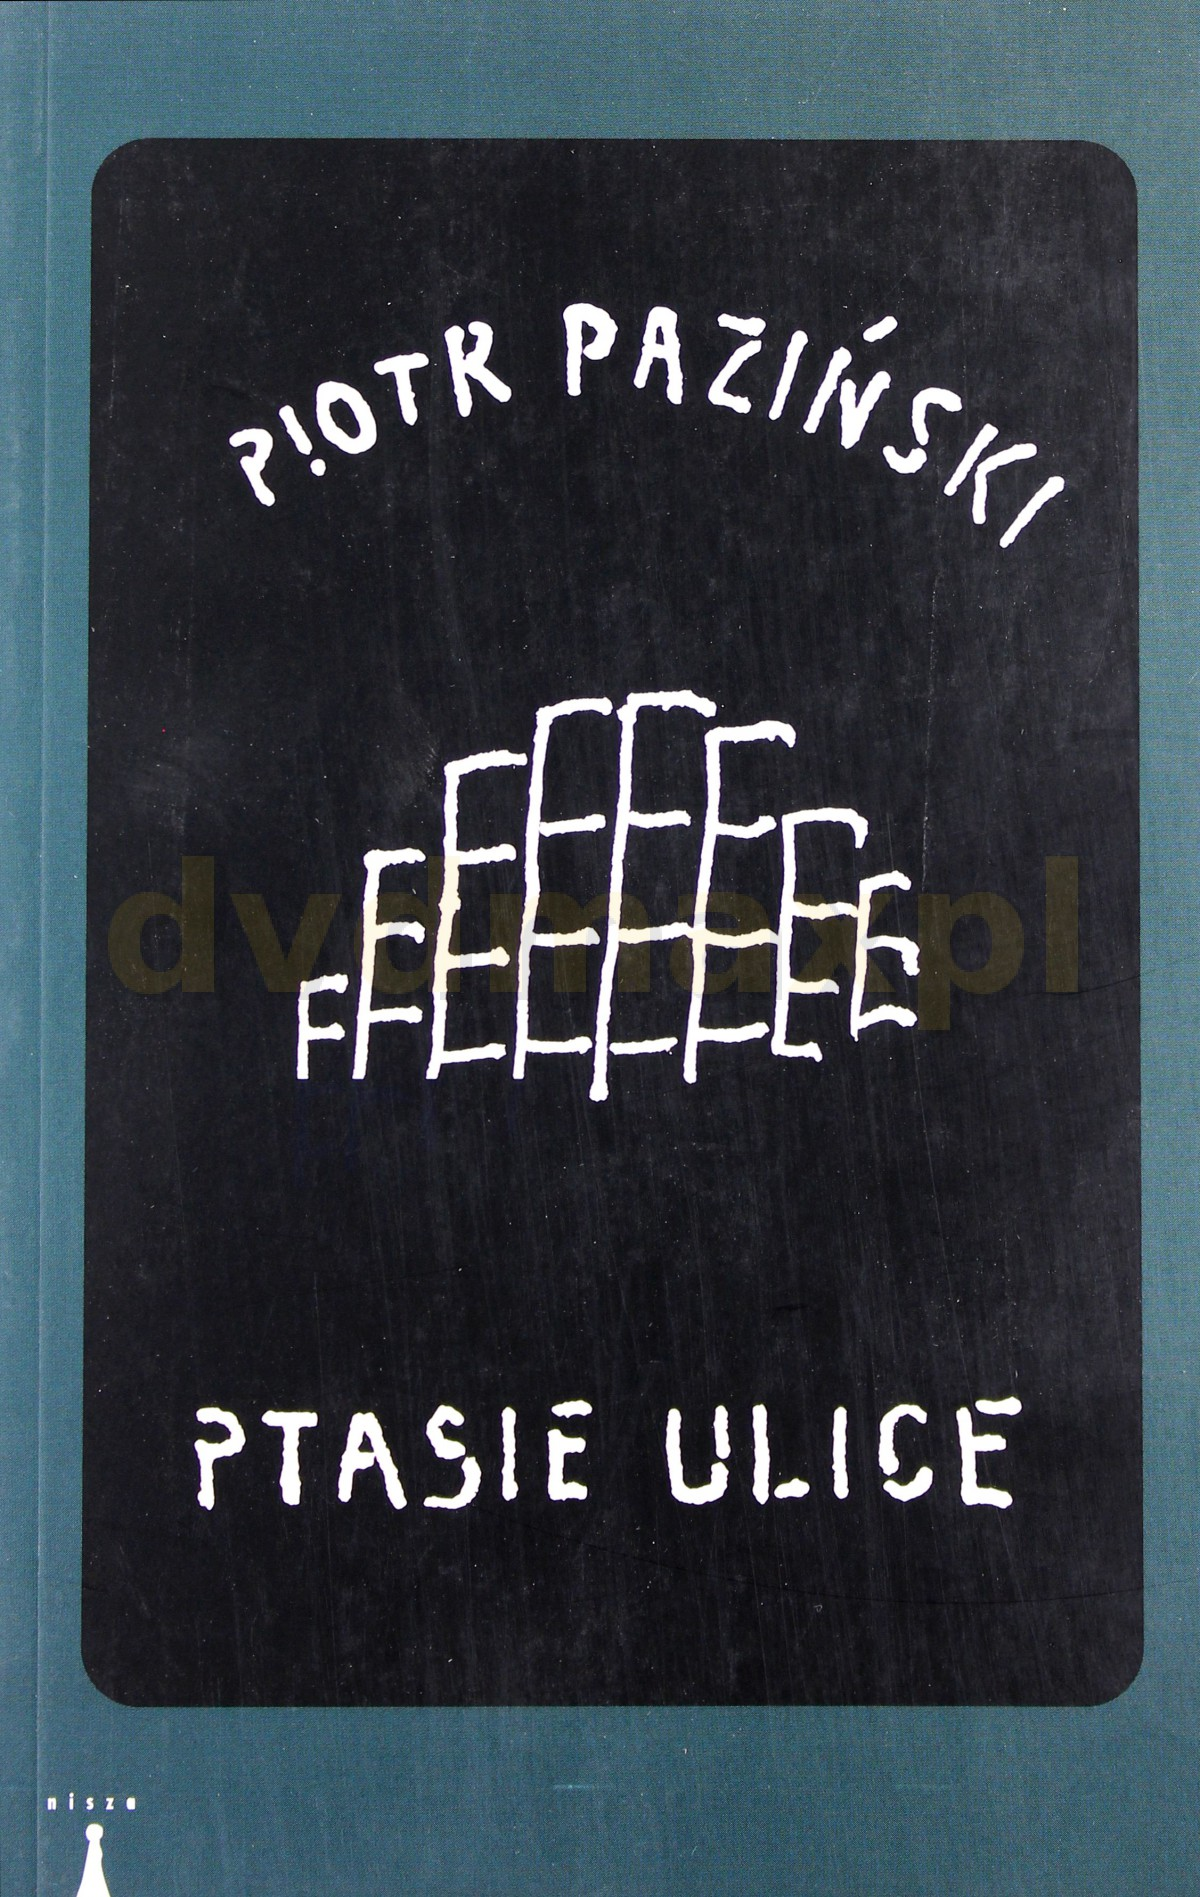 Ptasie Ulice - Paziński Piotr [KSIĄŻKA] - Paziński Piotr